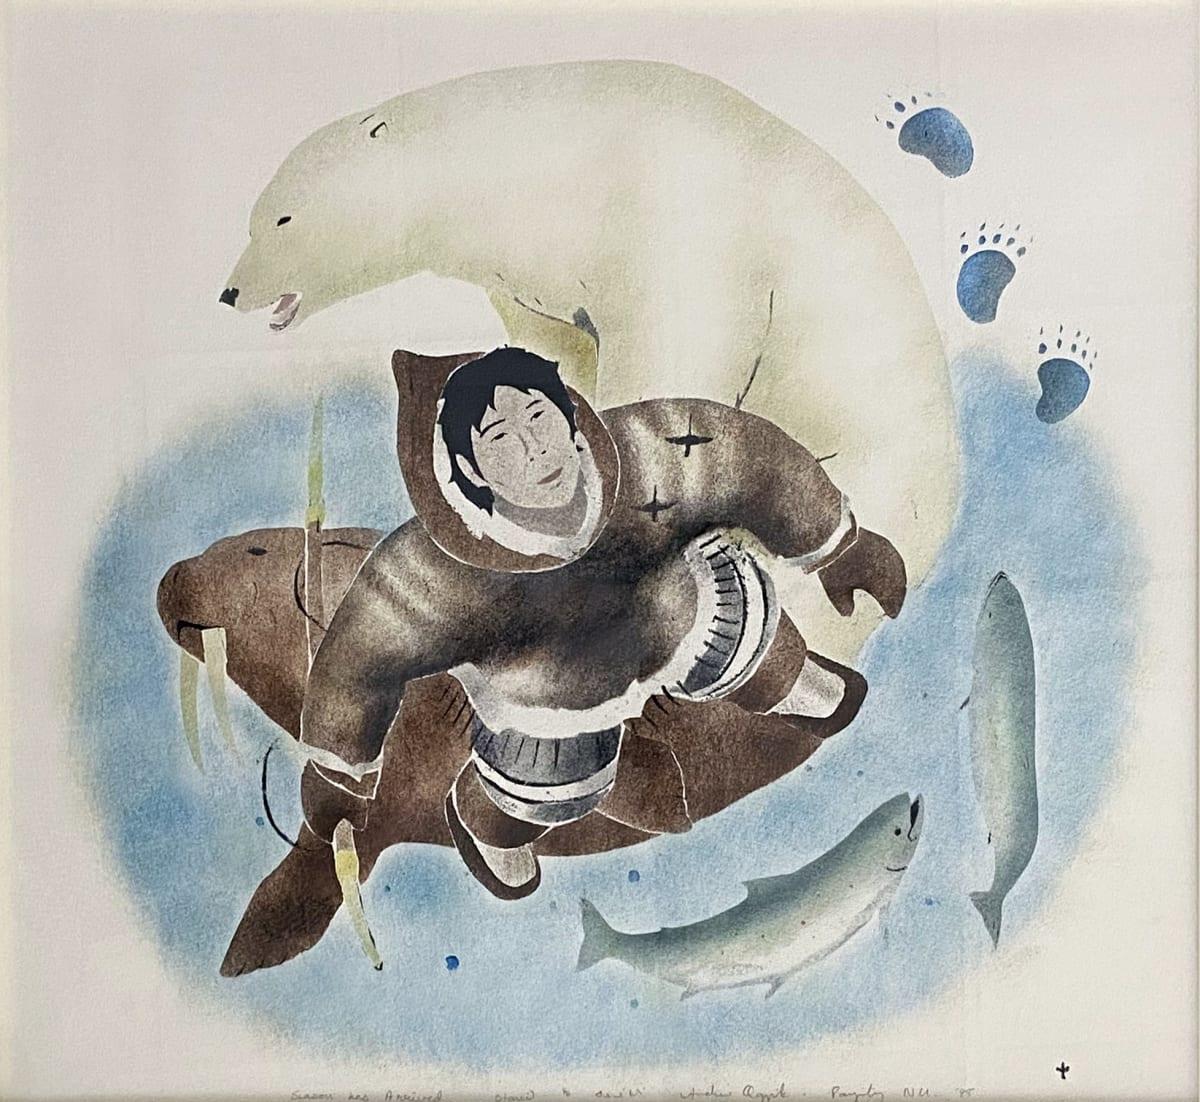 Lot 76 ANDREW QAPPIK (1964-) C.M., PANNIRTUQ (PANGNIRTUNG) Season has Arrived, 1998 stencil, framed, sight: 21 x 19 in (53.3 x 48.3 cm) Estimate: $400 — $600